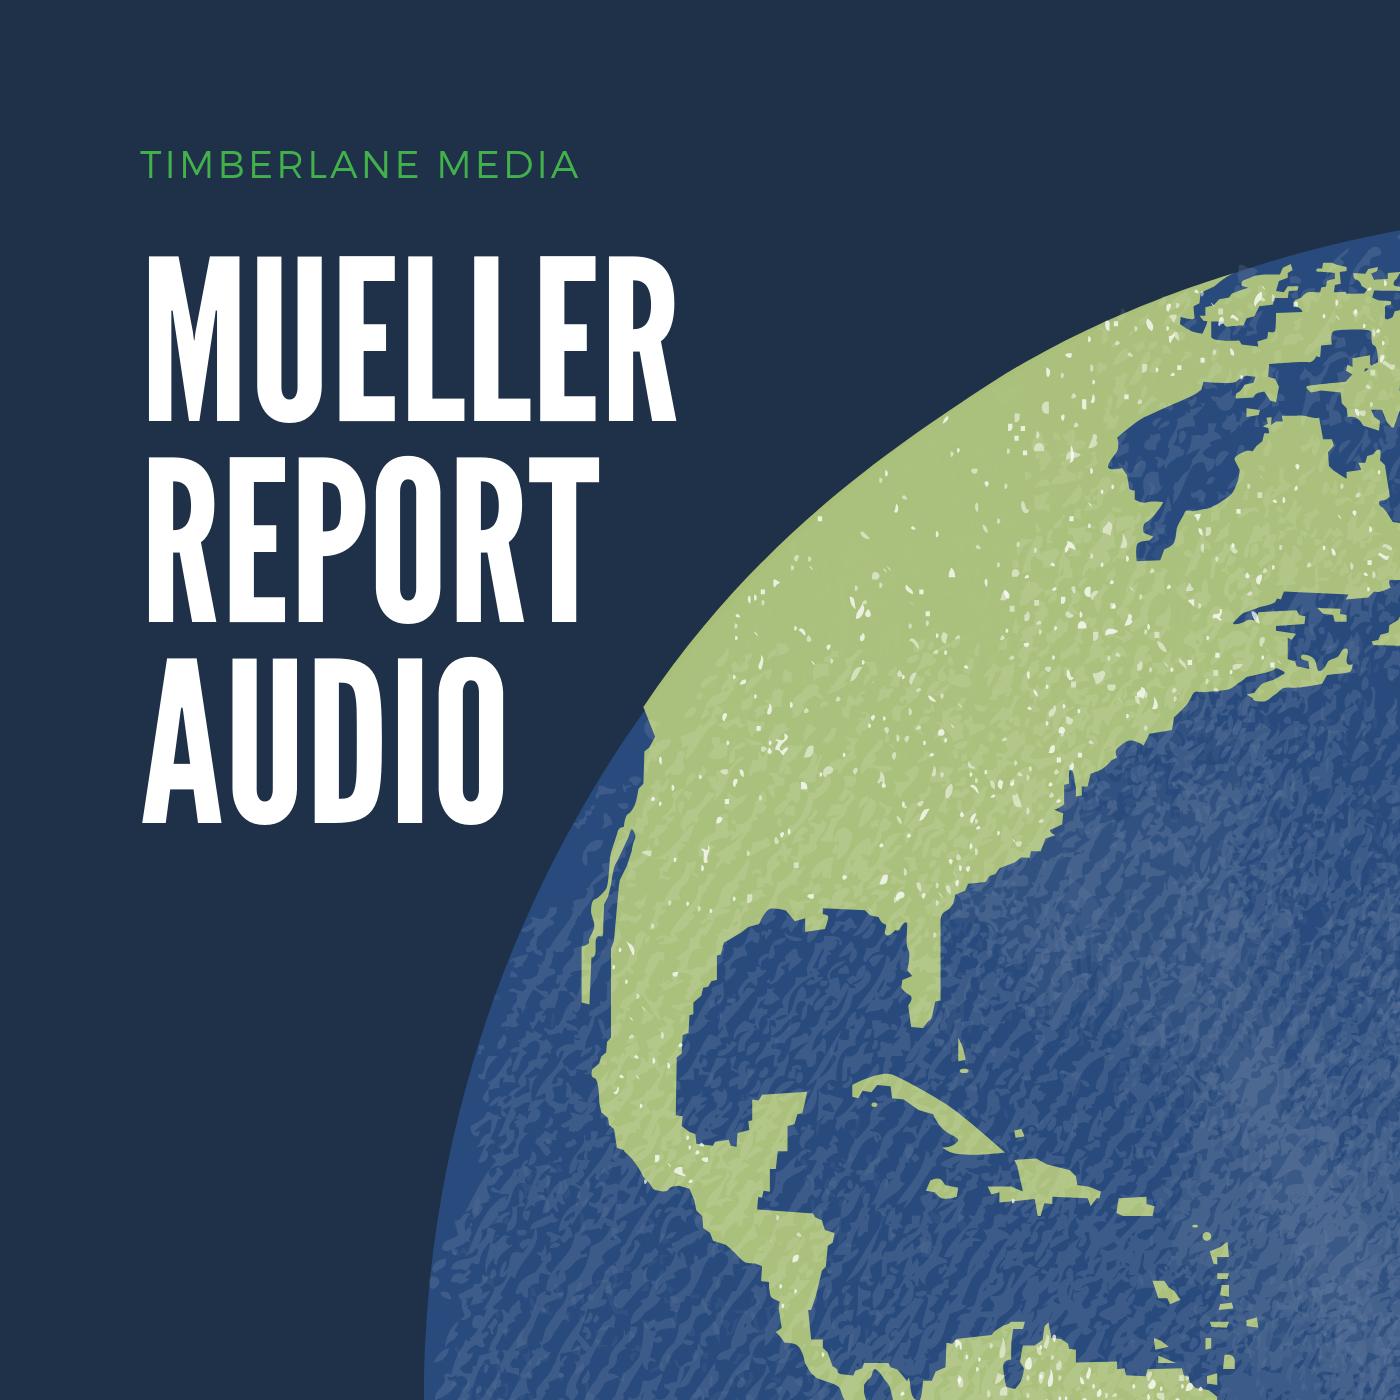 Introduction to Volume 2 (Mueller Report, Nov. 2020 update)